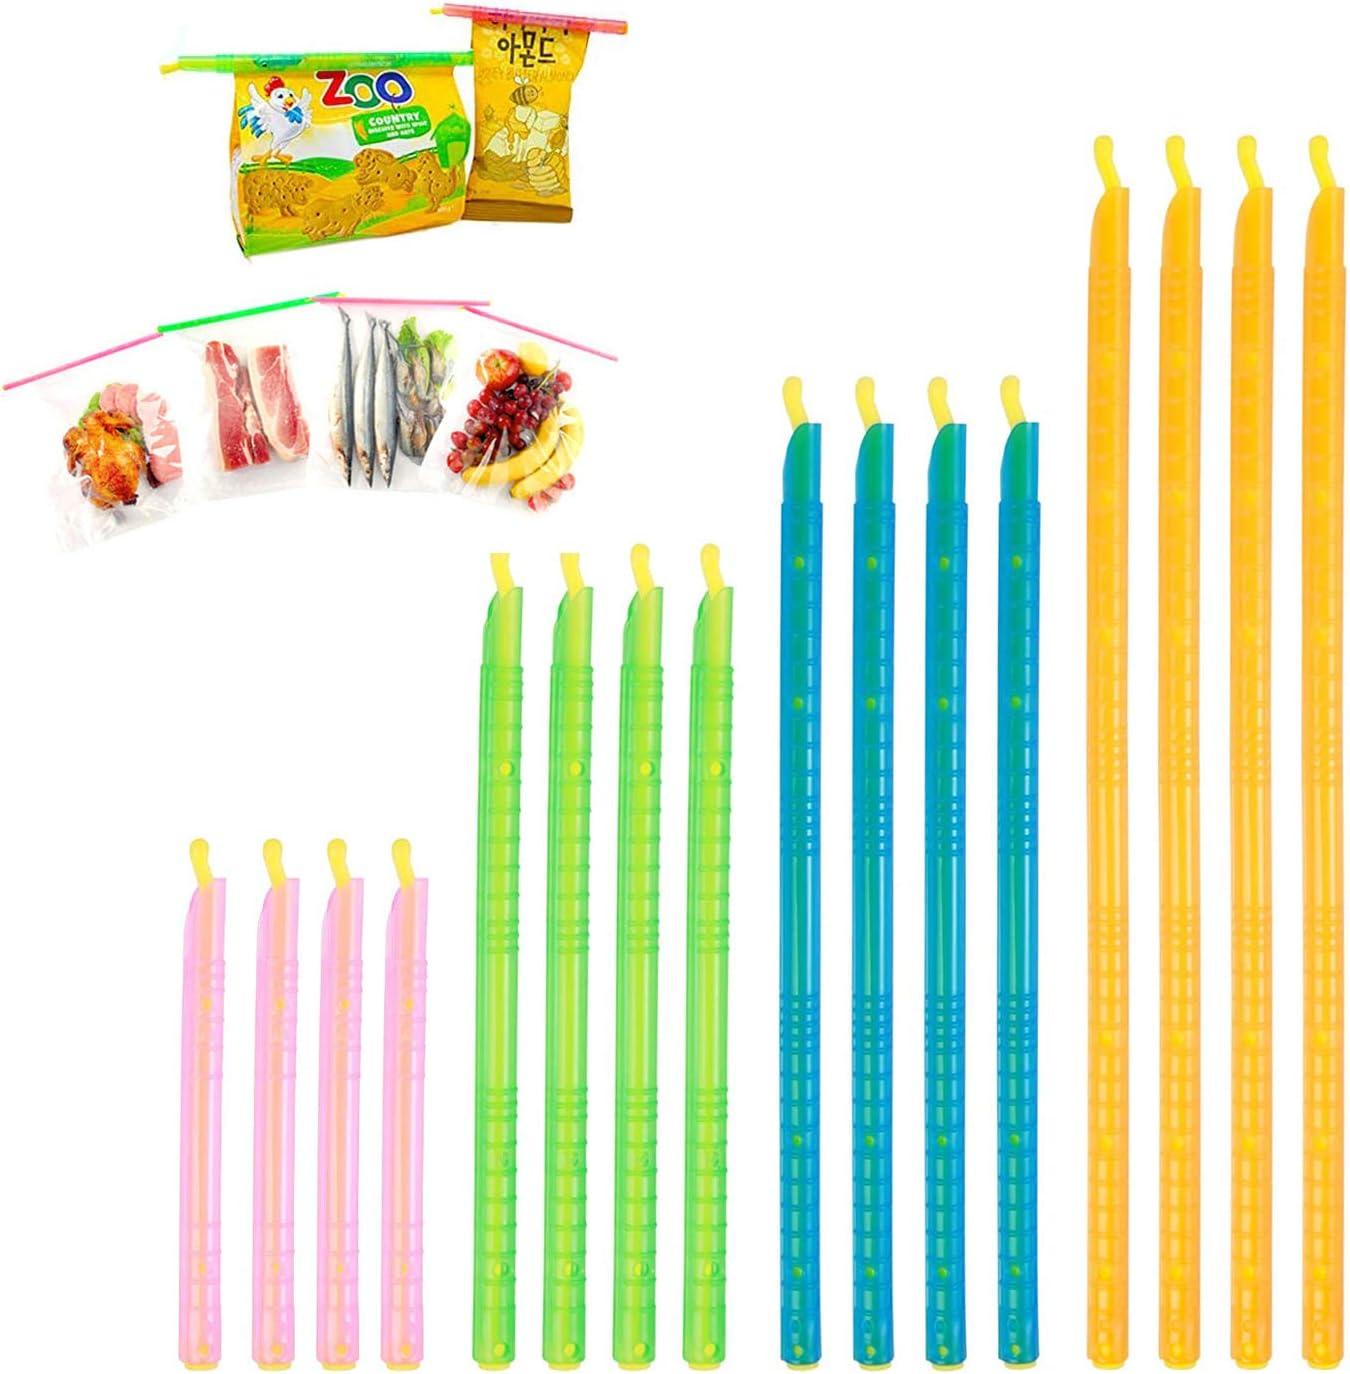 Magic Bag Plastic Sealing Clips, Food Clip Sealer Stick,Colorful Stay Fresh Gripstic Sealer Sticks,4 Sizes Kitchen Food Storage Clips(16-PCS